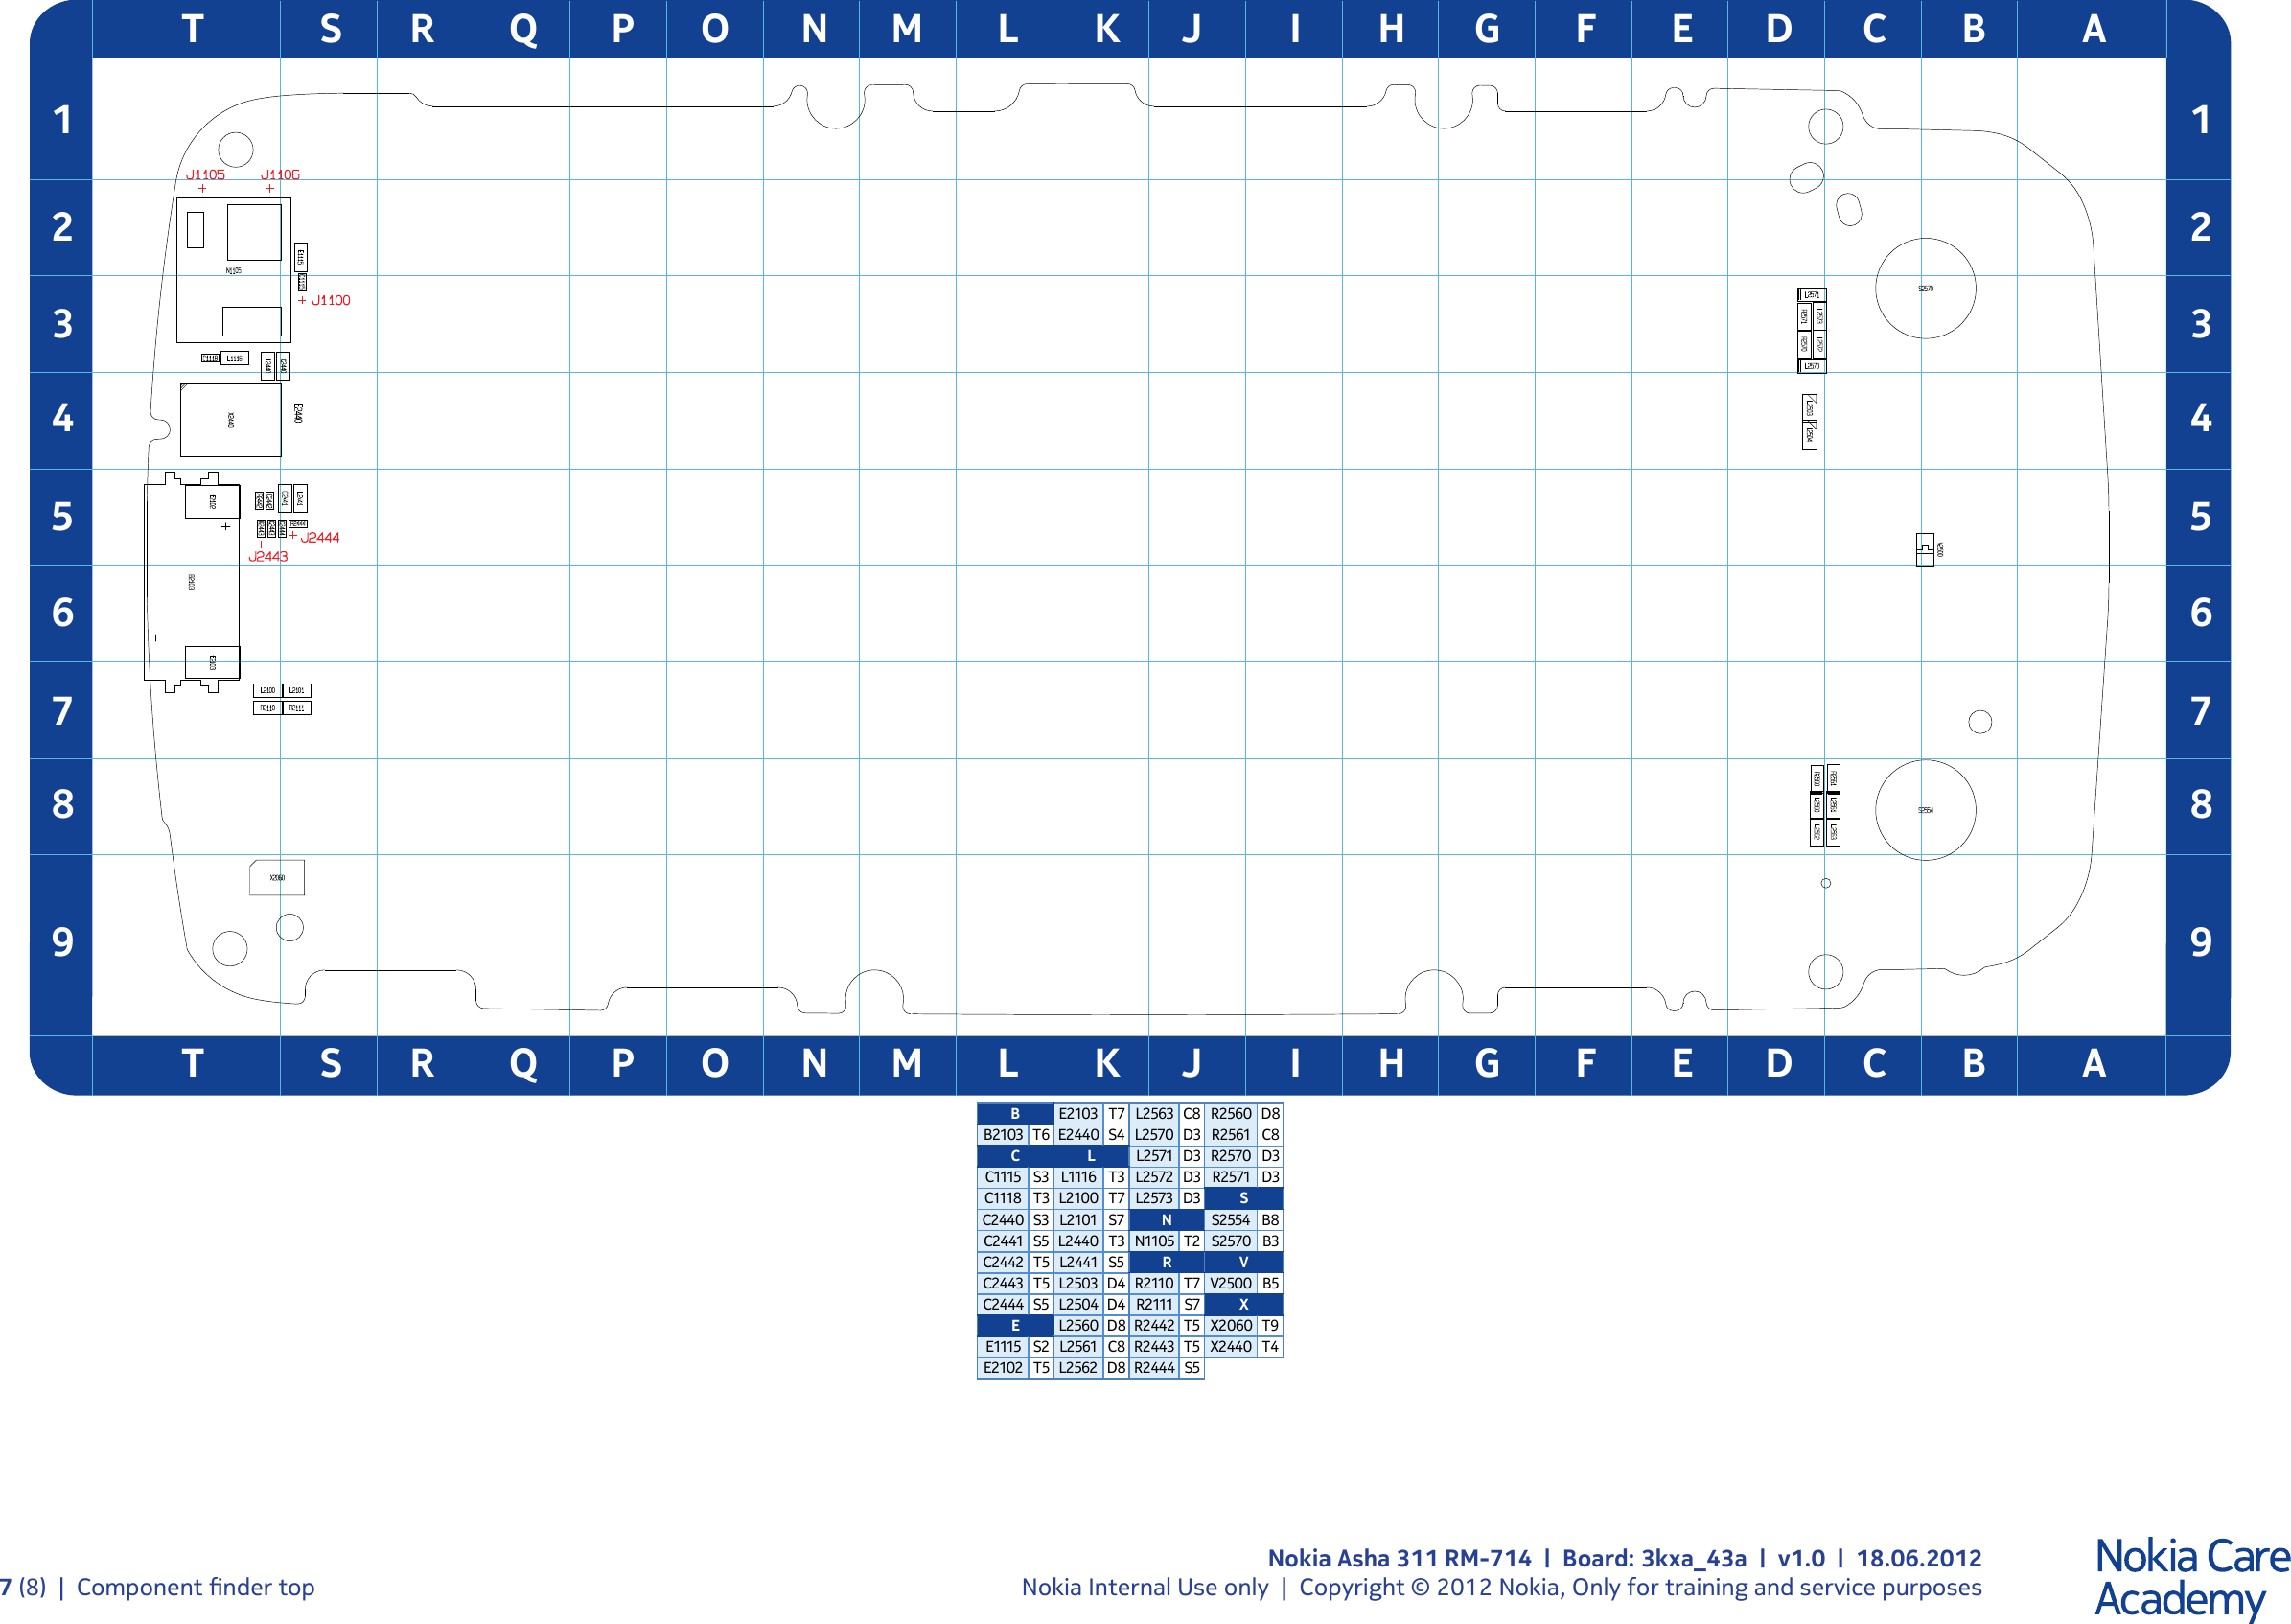 Page 7 of 9 - Nokia Asha 311 RM-714 - Service Schematics. Www